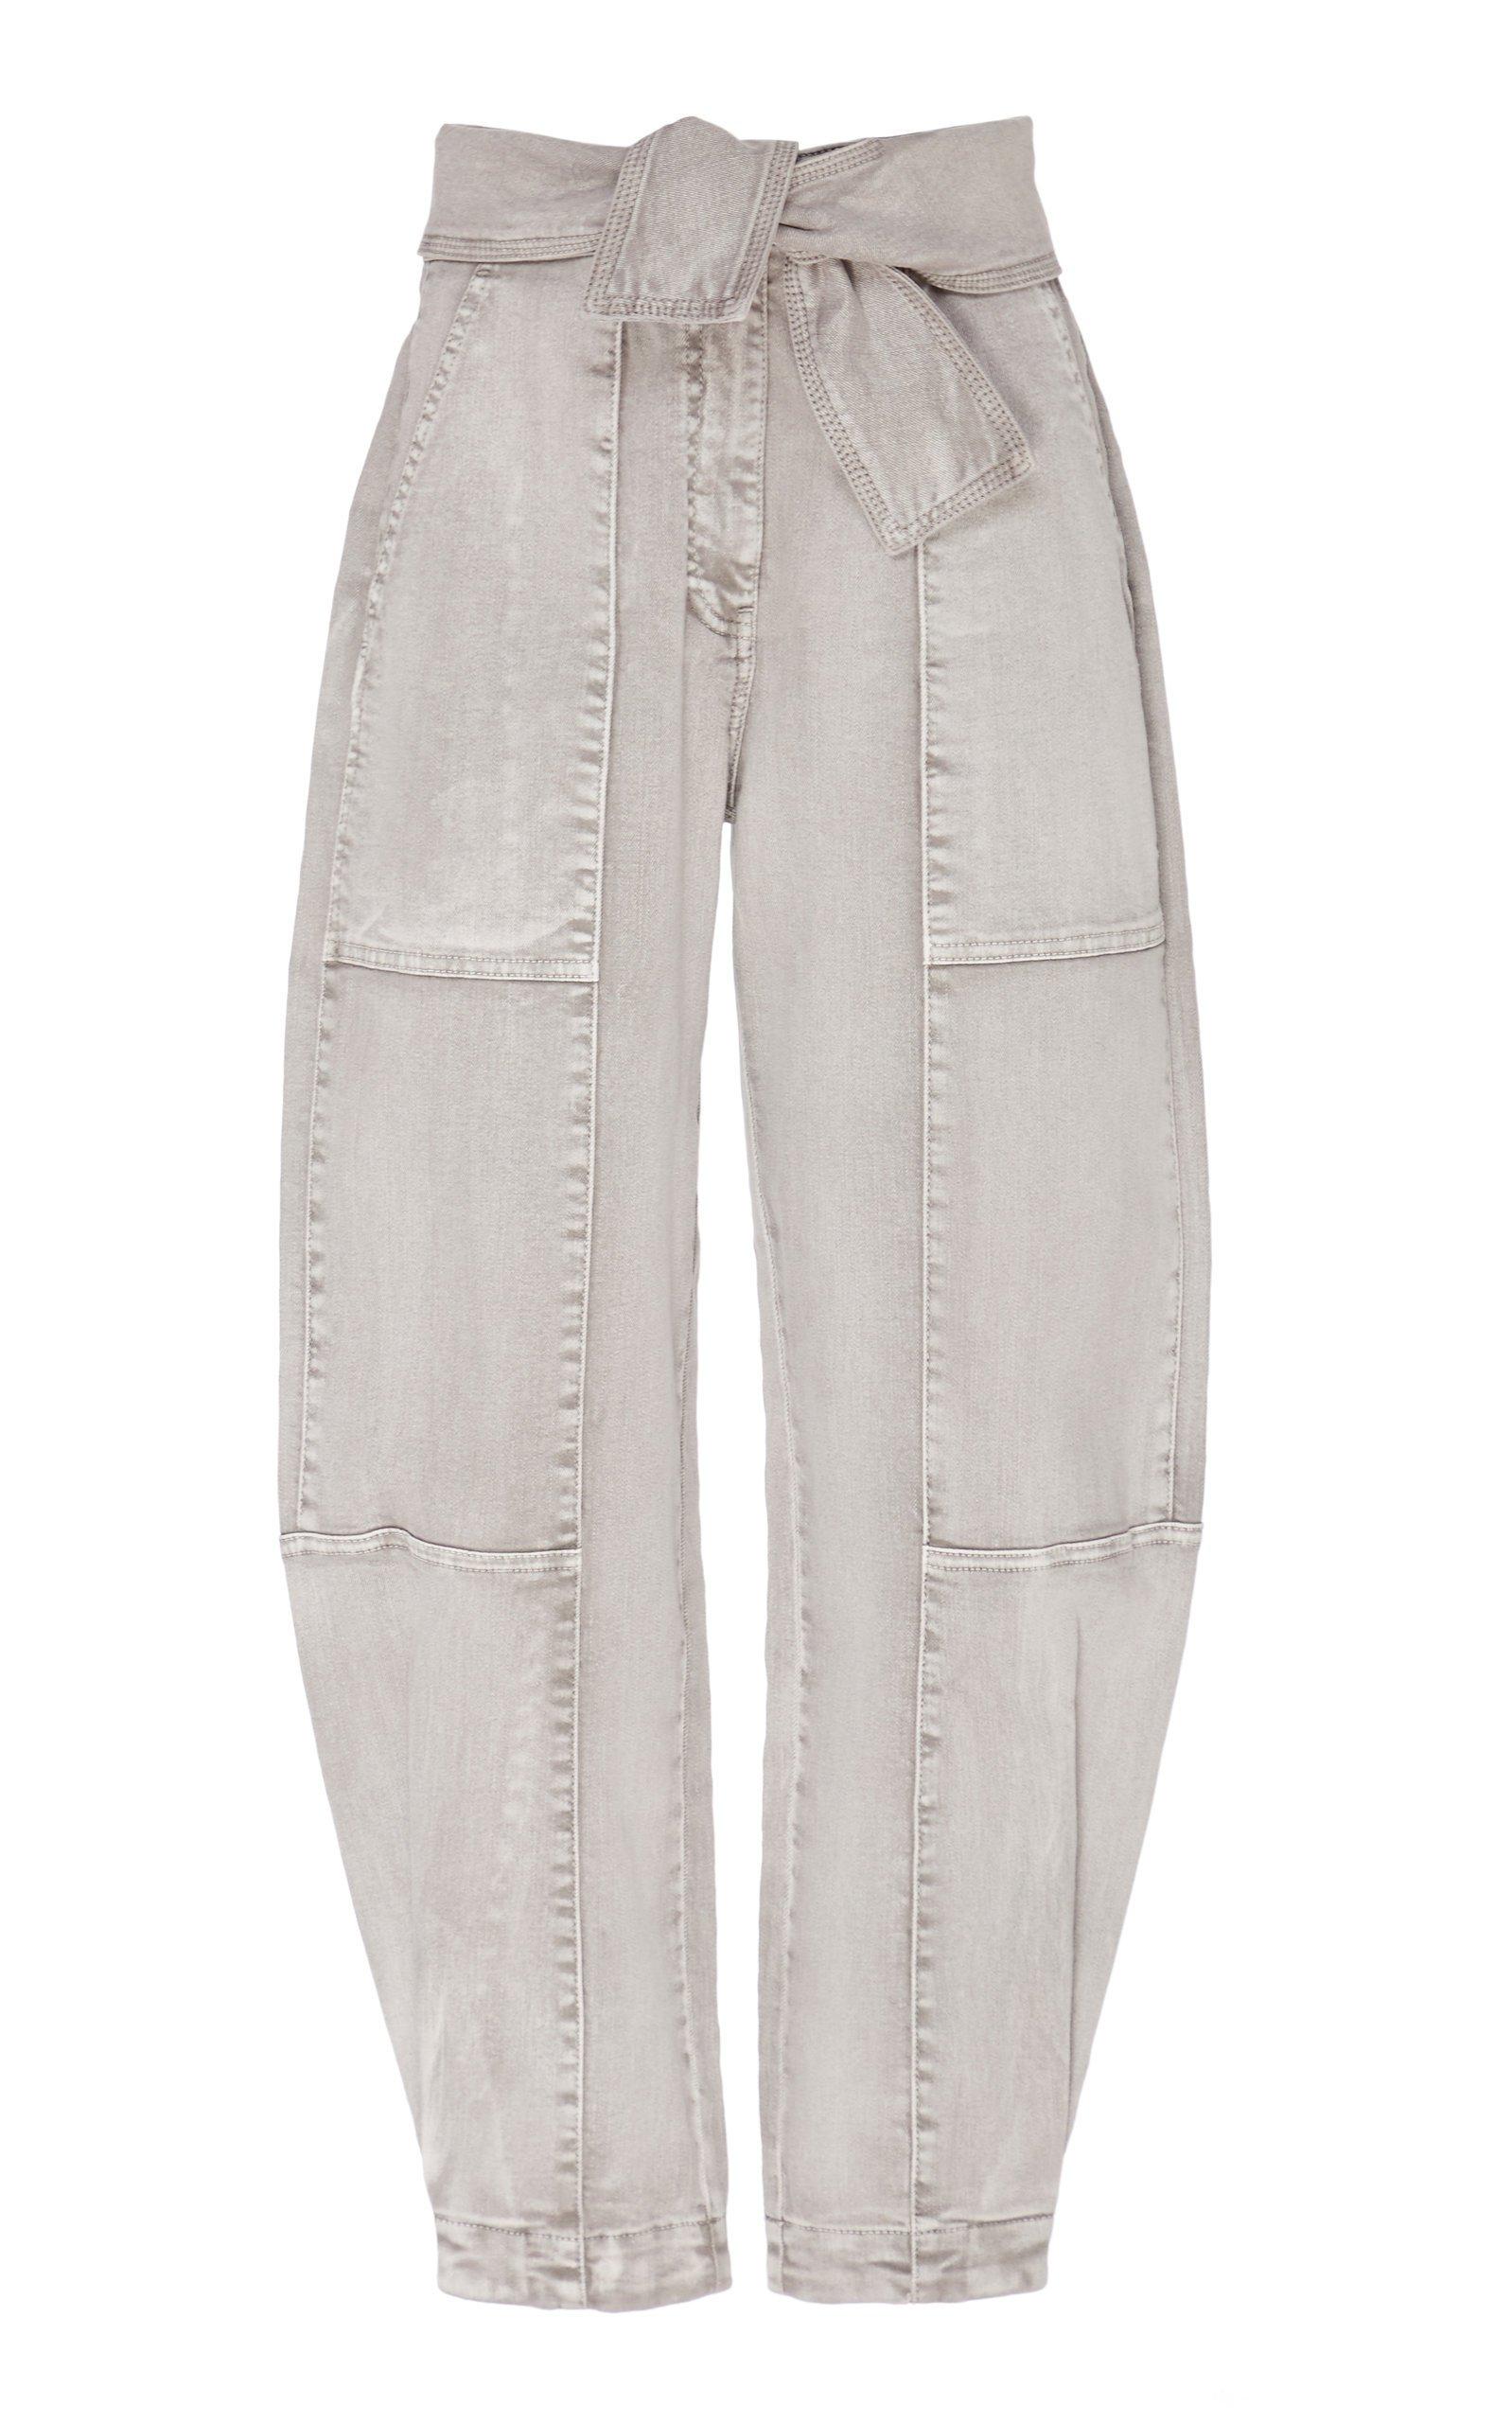 Ulla Johnson Storm Acid Wash Cropped Jean